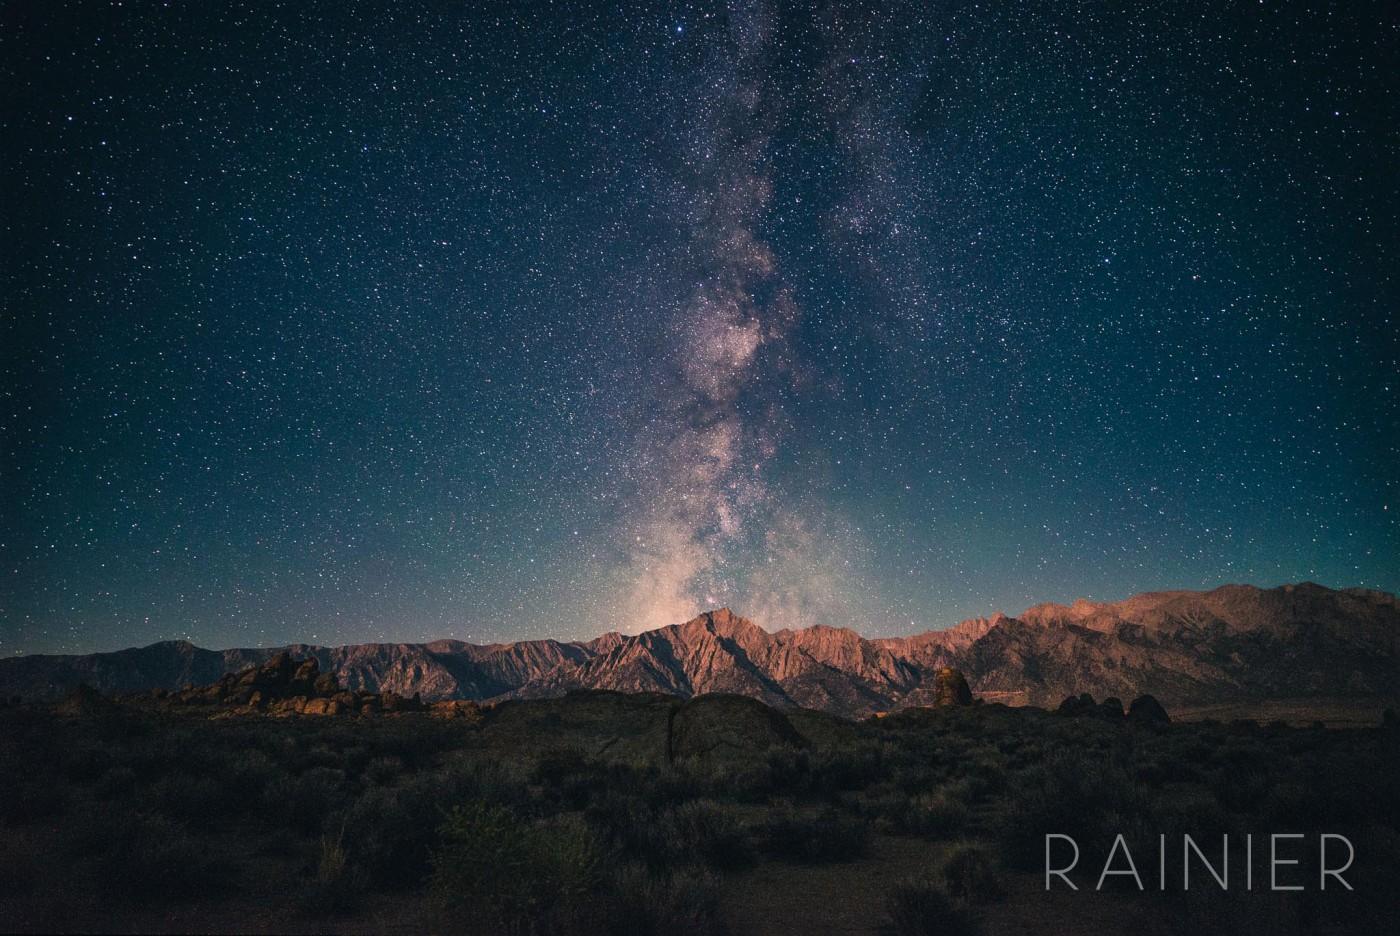 Rainier Milky Way Astrophotography Lonely Speck Lightroom Preset 2 Lonely Speck